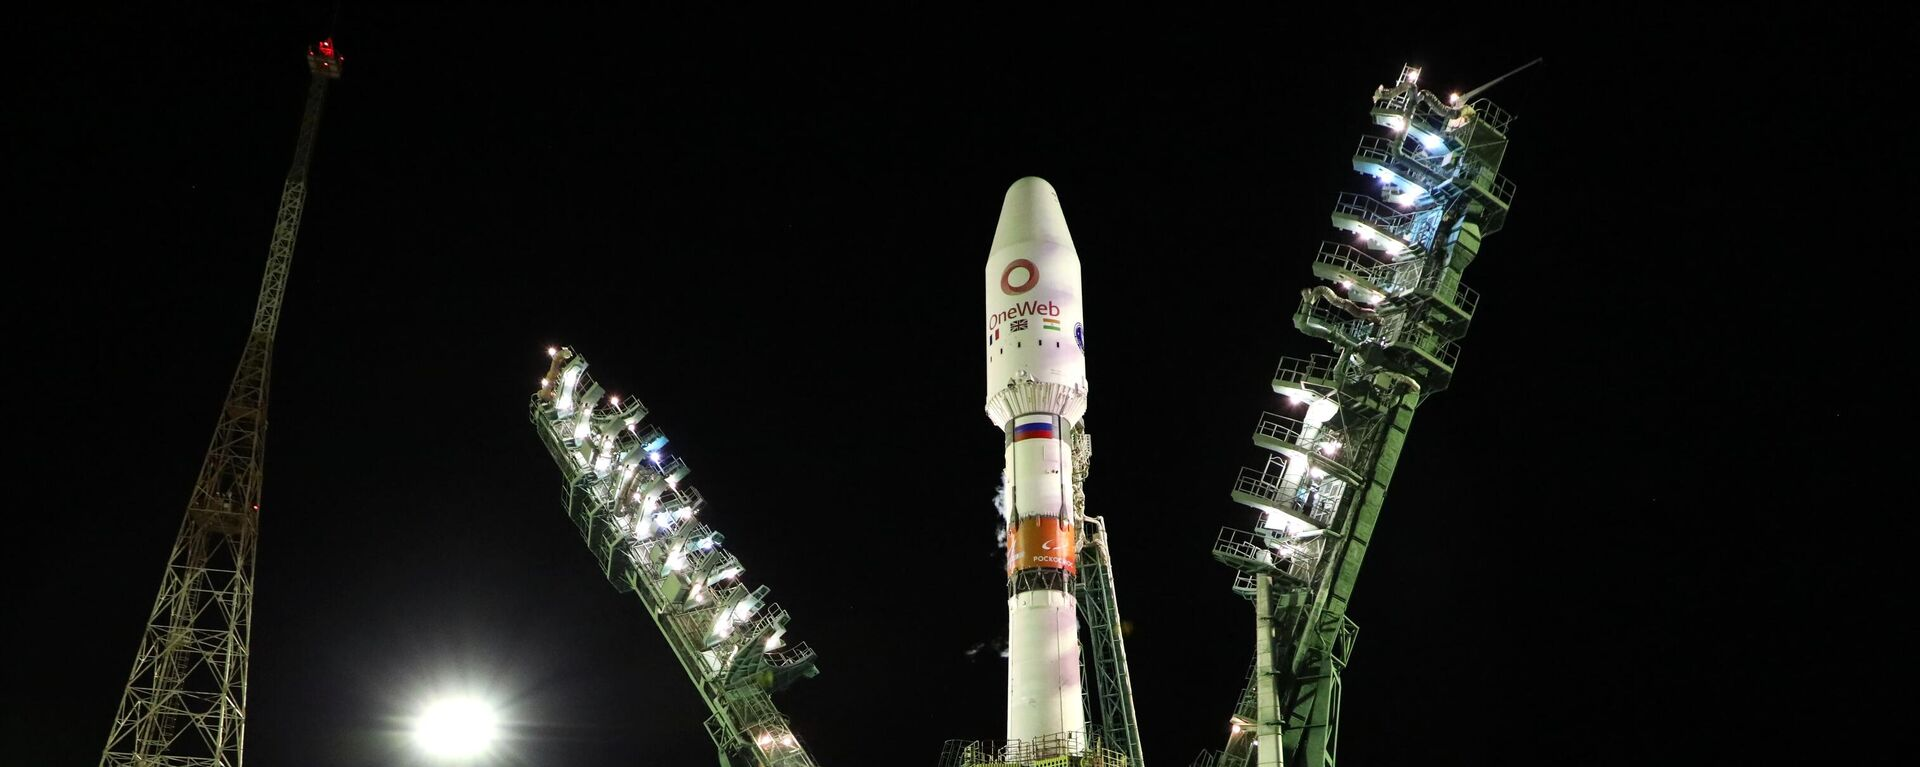 Un cohete Soyuz con satélites británicos OneWeb a bordo - Sputnik Mundo, 1920, 14.10.2021